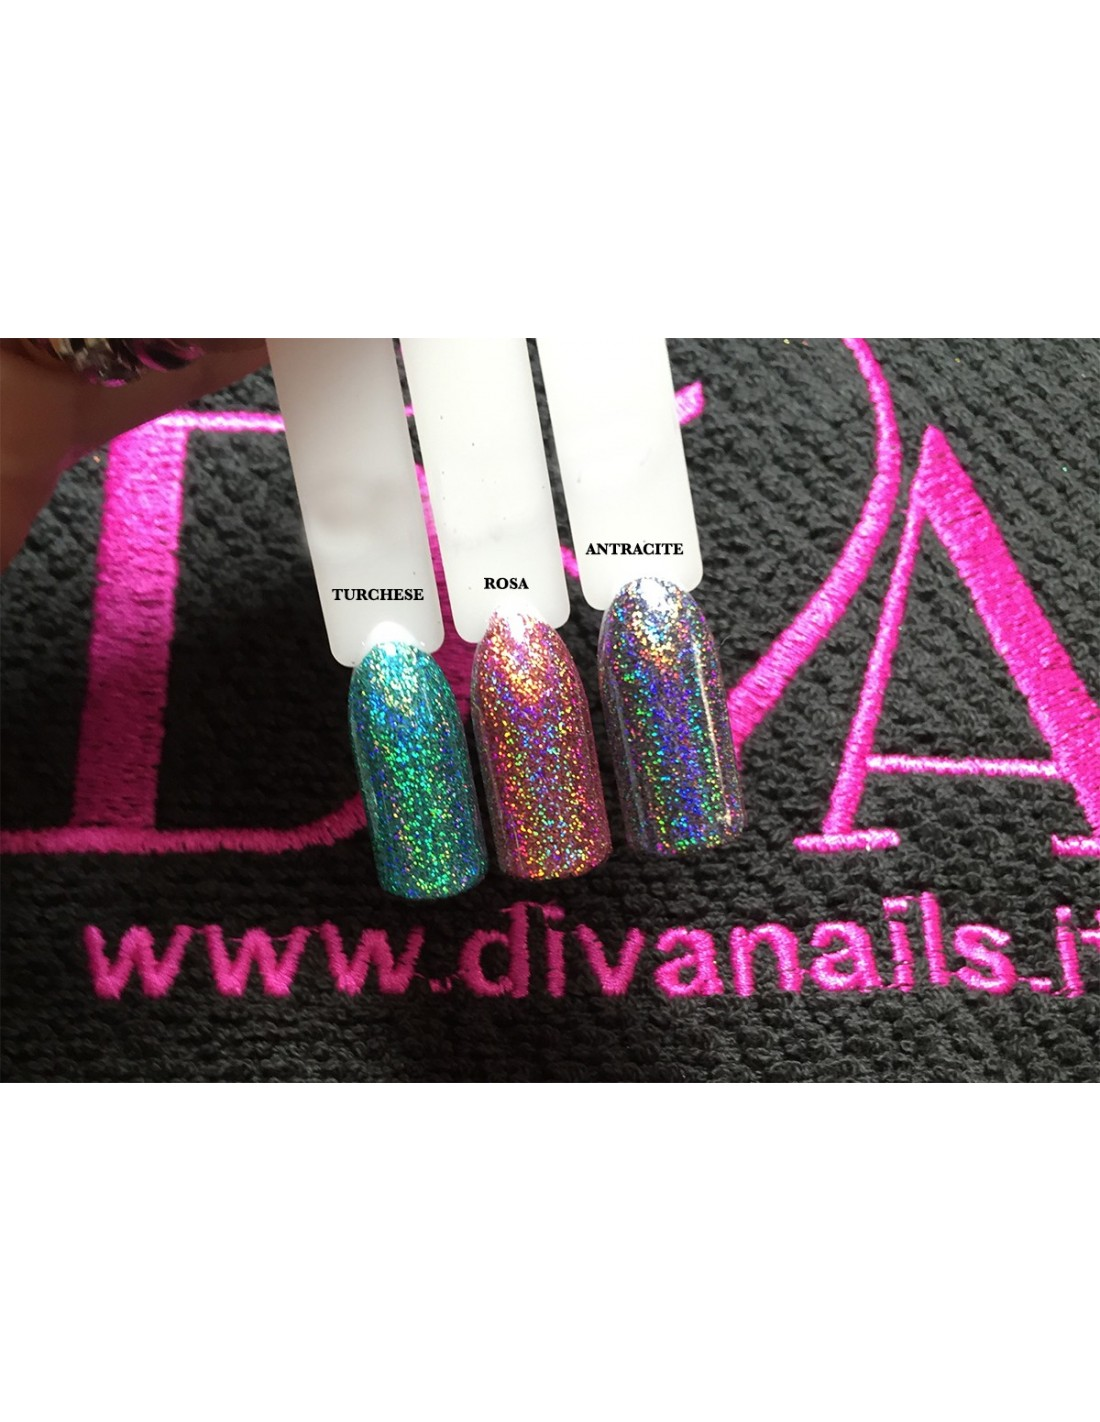 Polvere di ninfa hologram rosa 3g diva nails shop - Diva nails prodotti ...